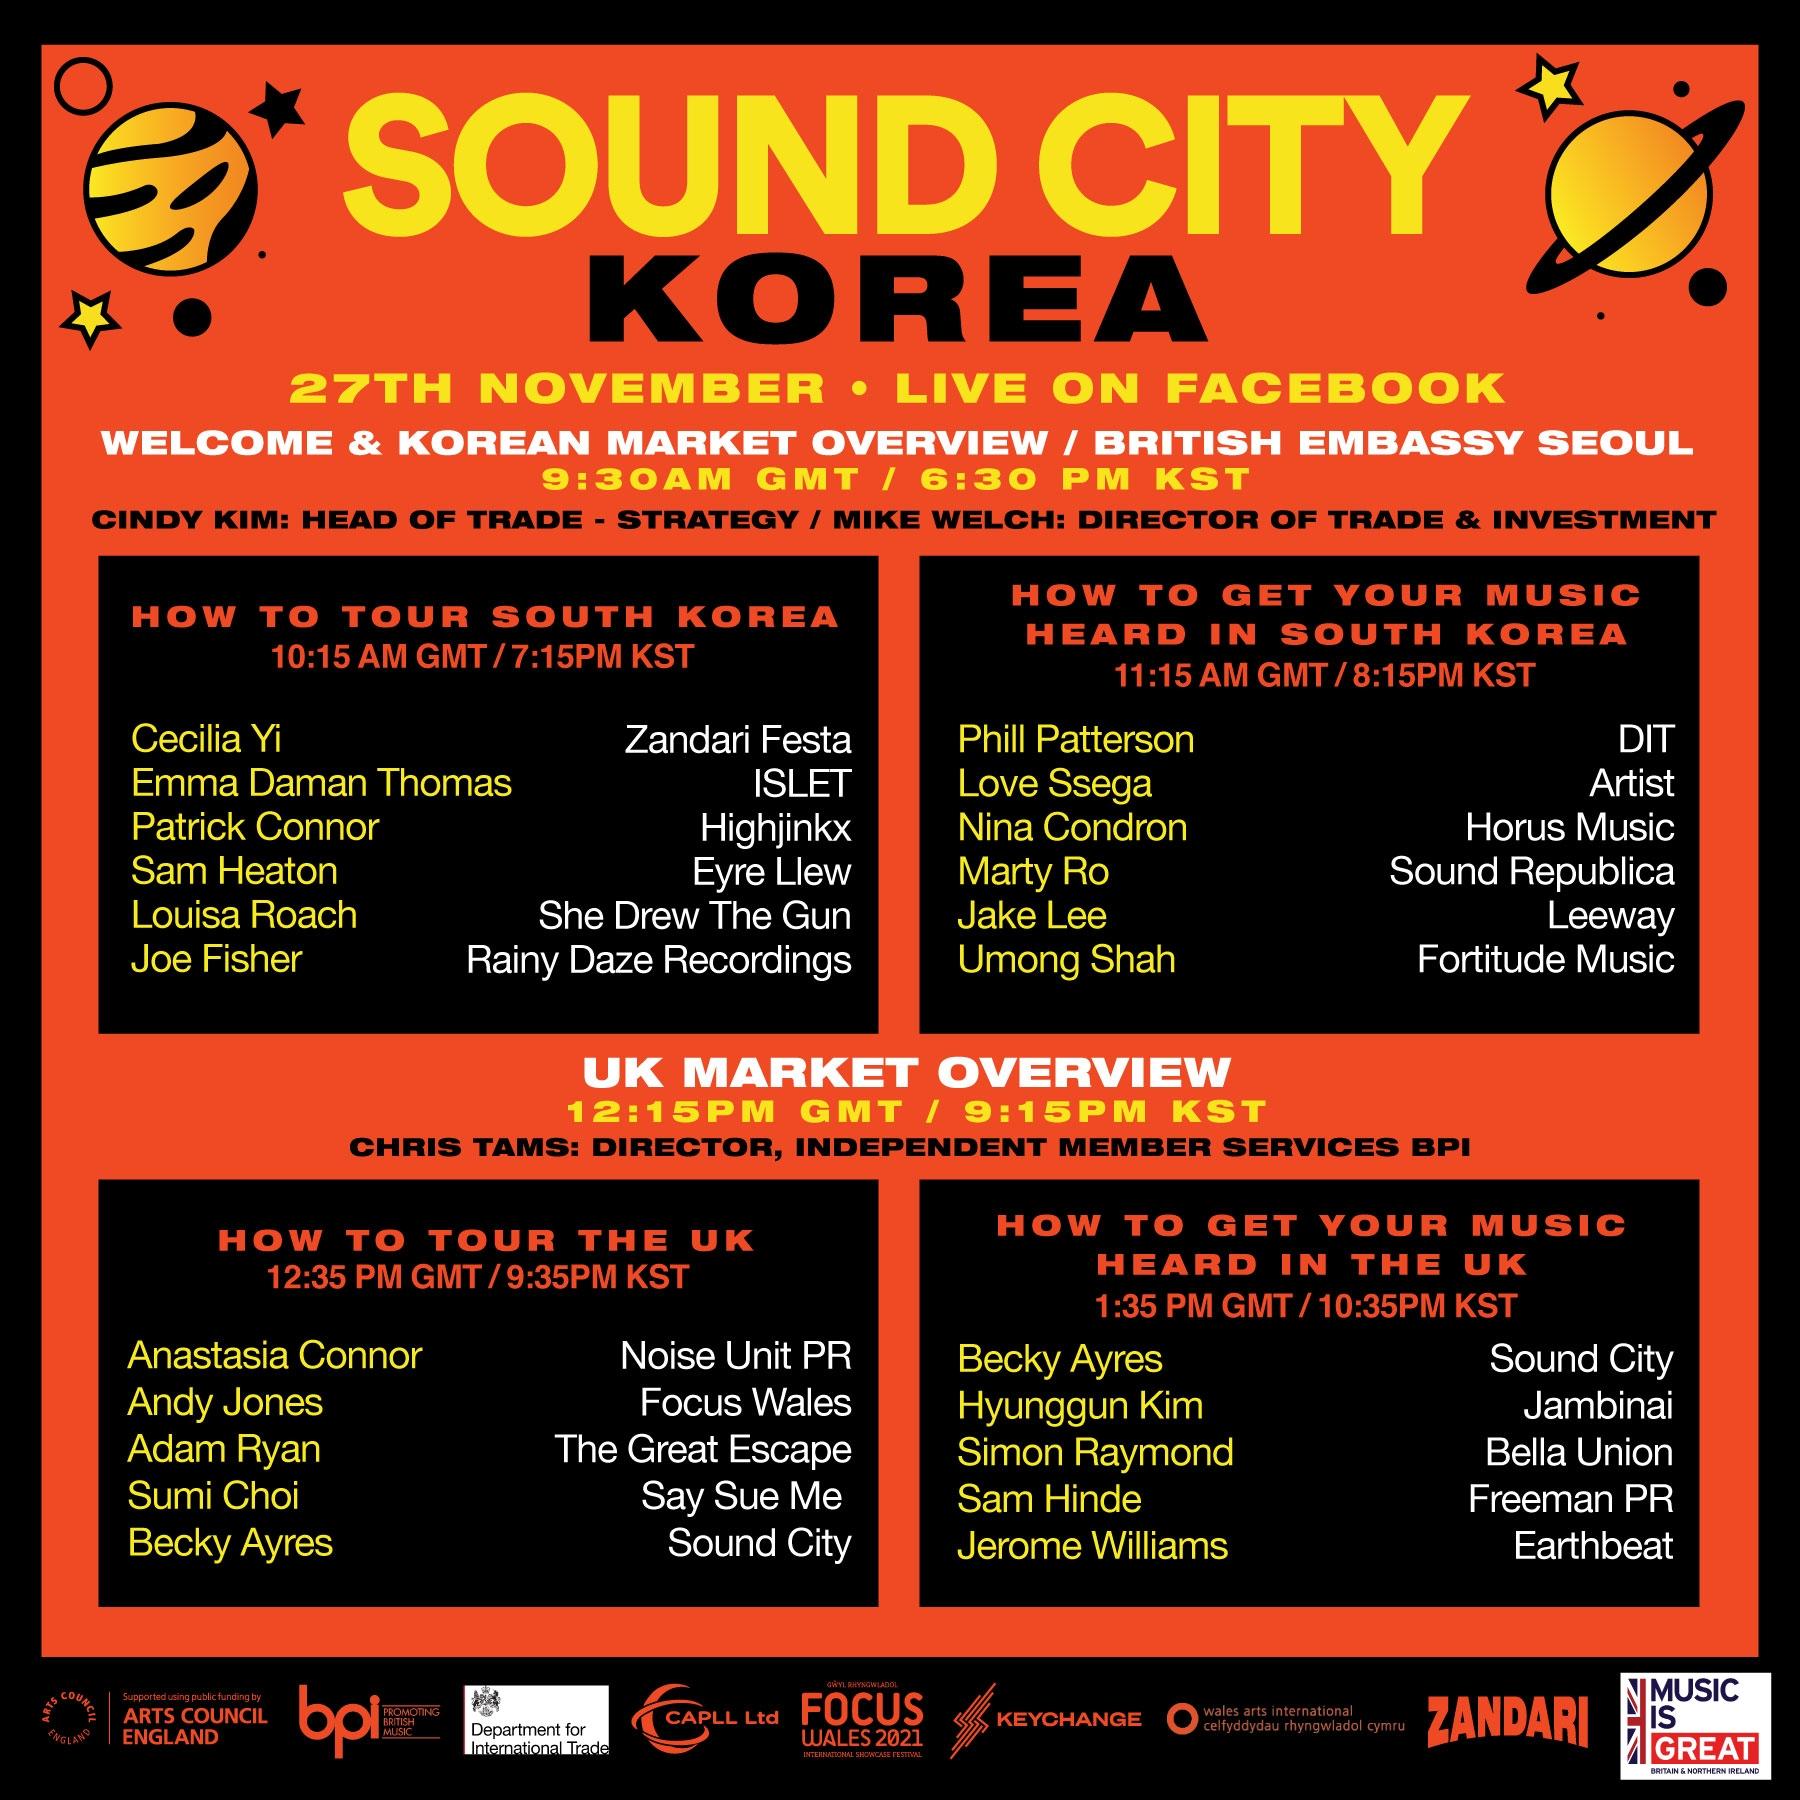 The complete Sound City Korea 2020 tmetable